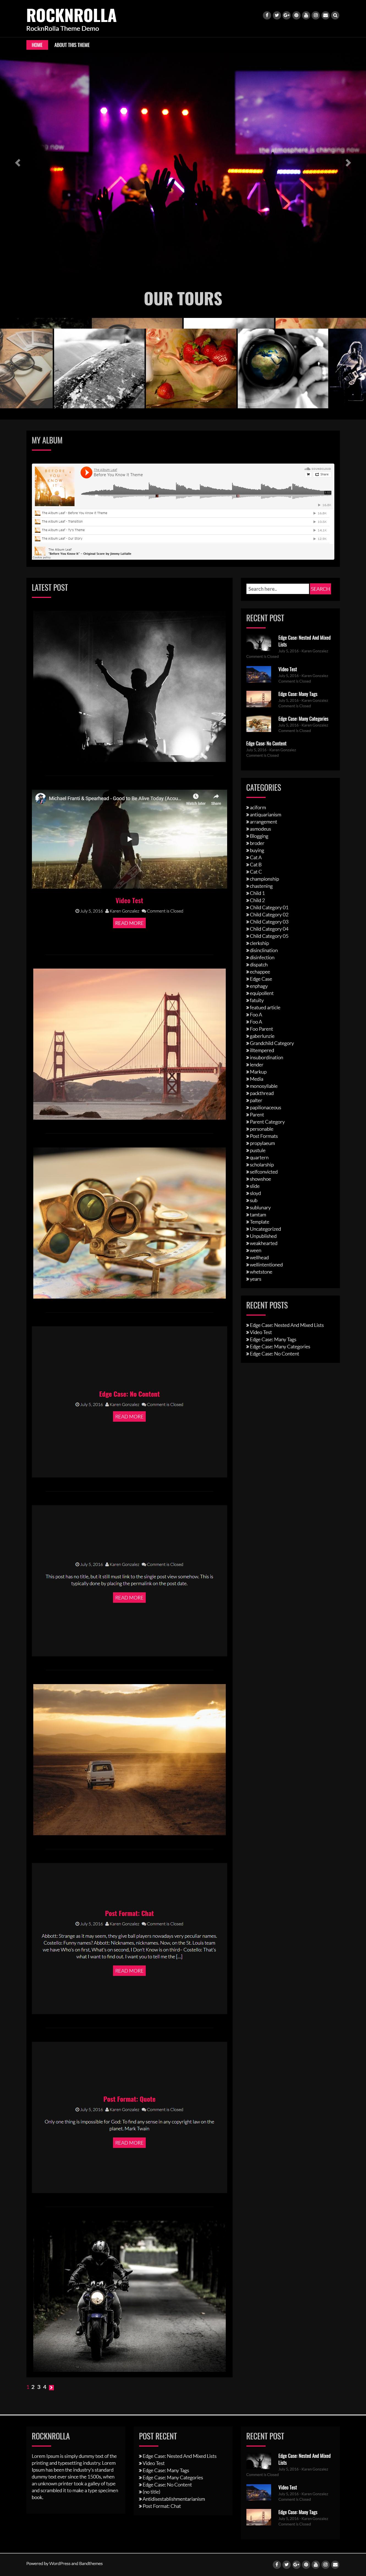 Rock N Rolla - Best Free Material Design WordPress Theme